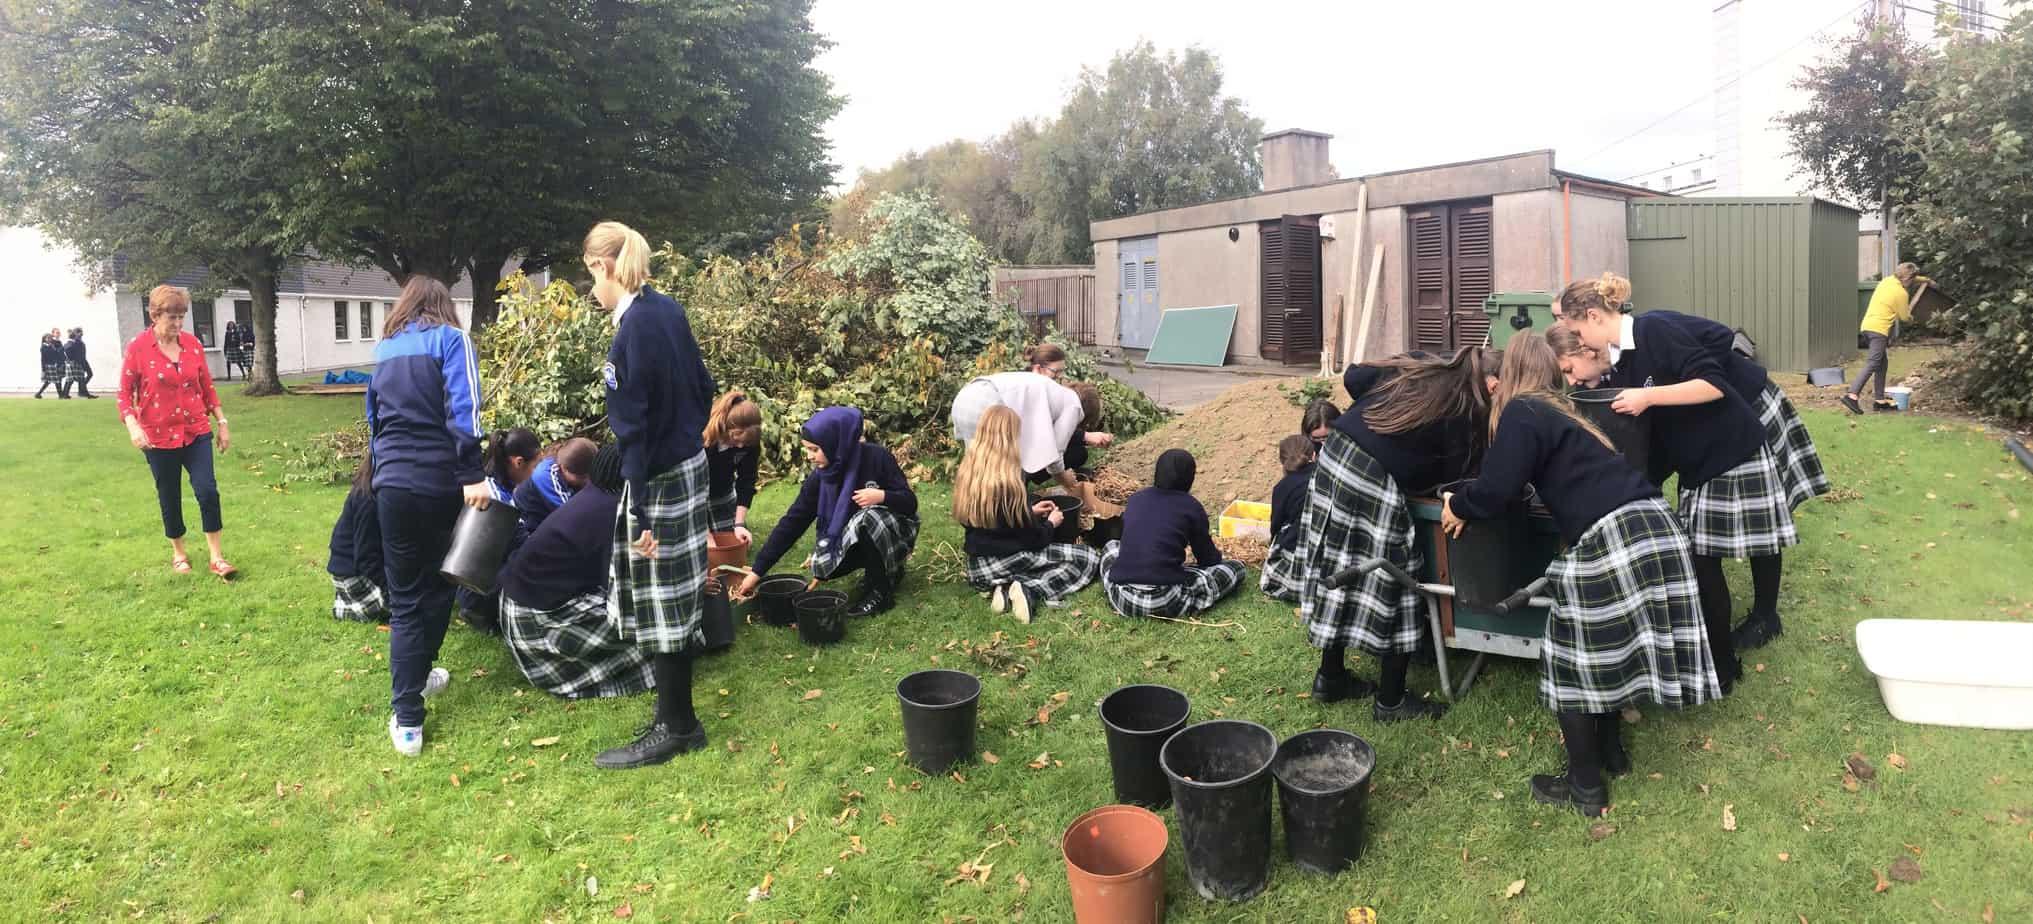 The Organic Garden Group planting bulbs